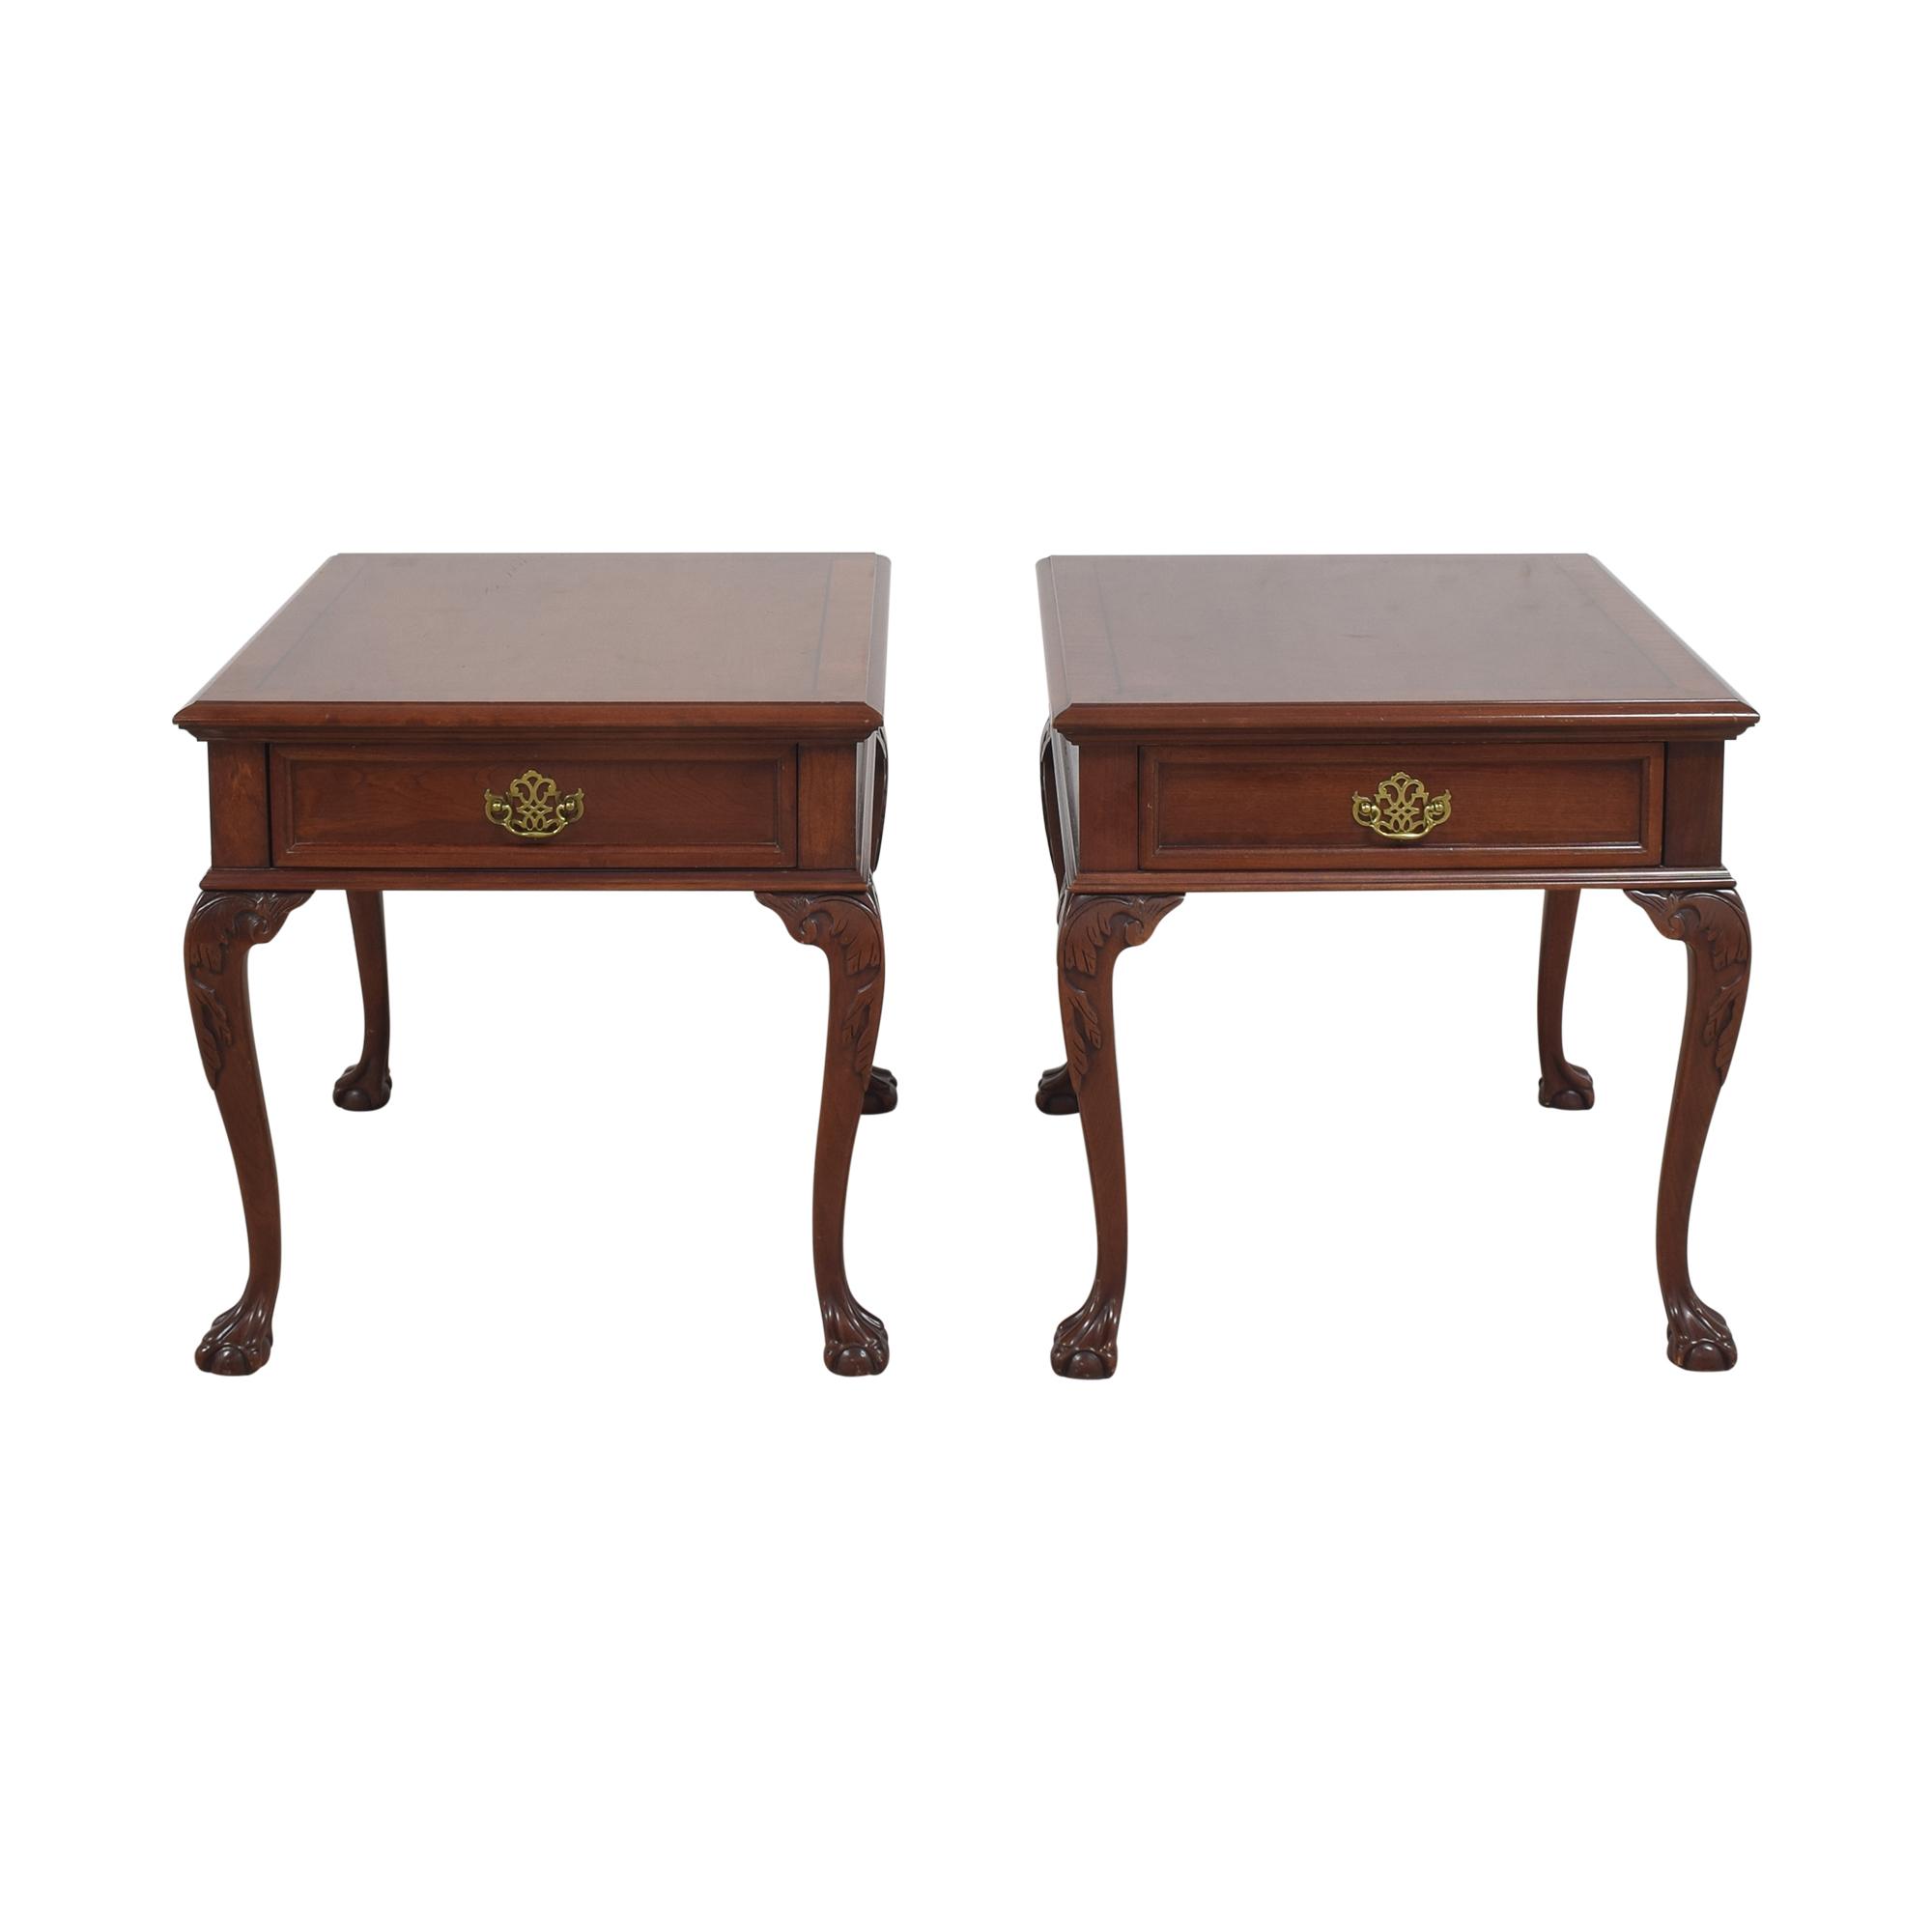 Pennsylvania House Pennsylvania House One Drawer End Tables on sale